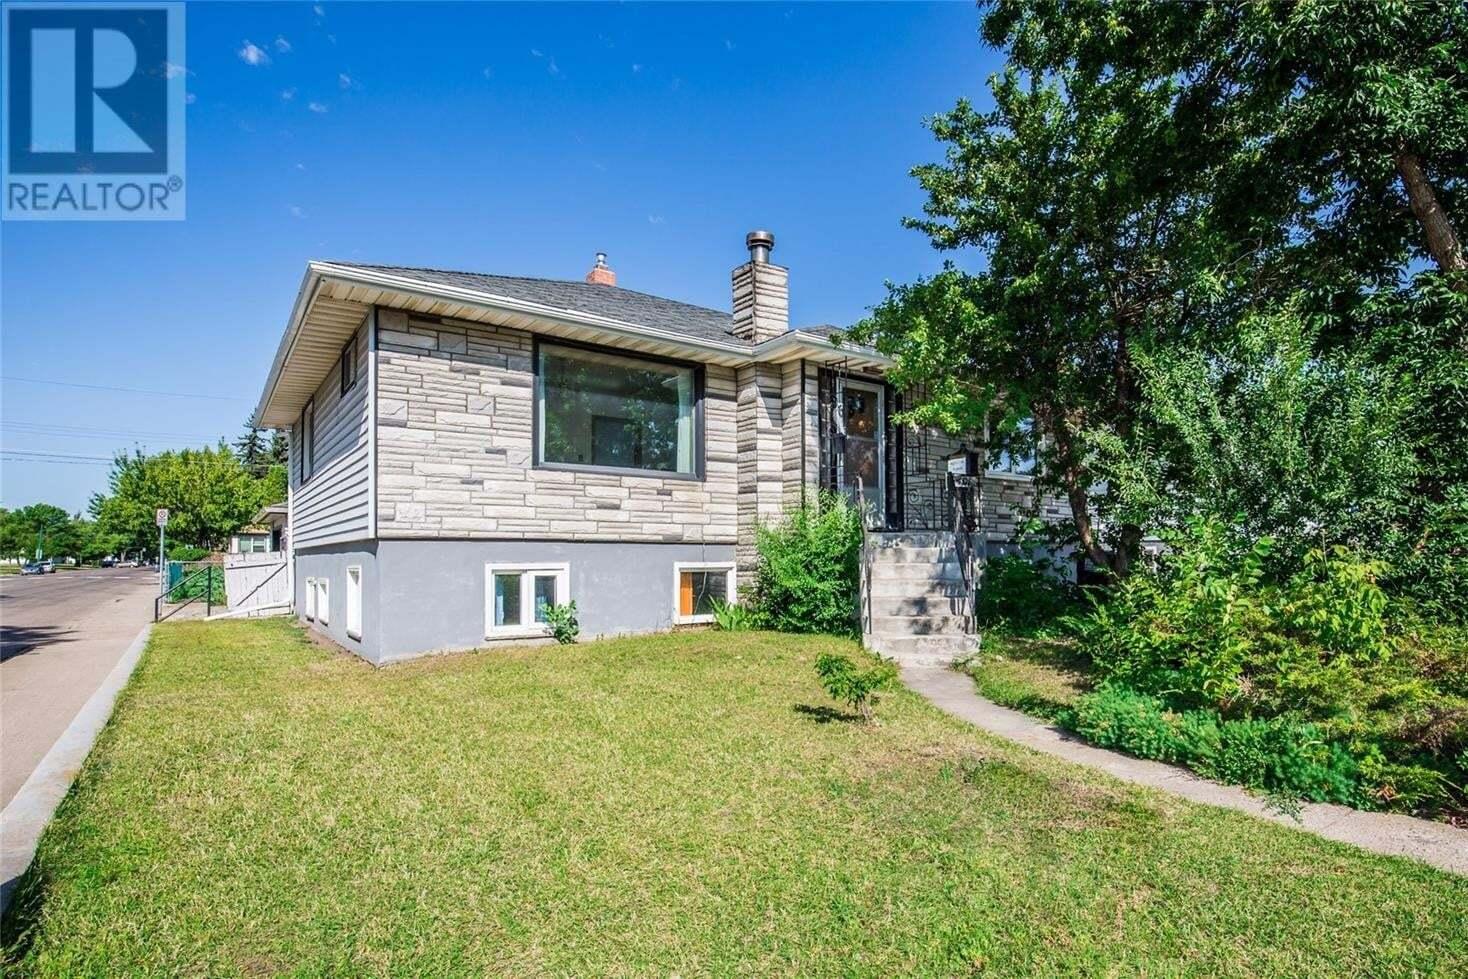 House for sale at 401 Q Ave N Saskatoon Saskatchewan - MLS: SK819251